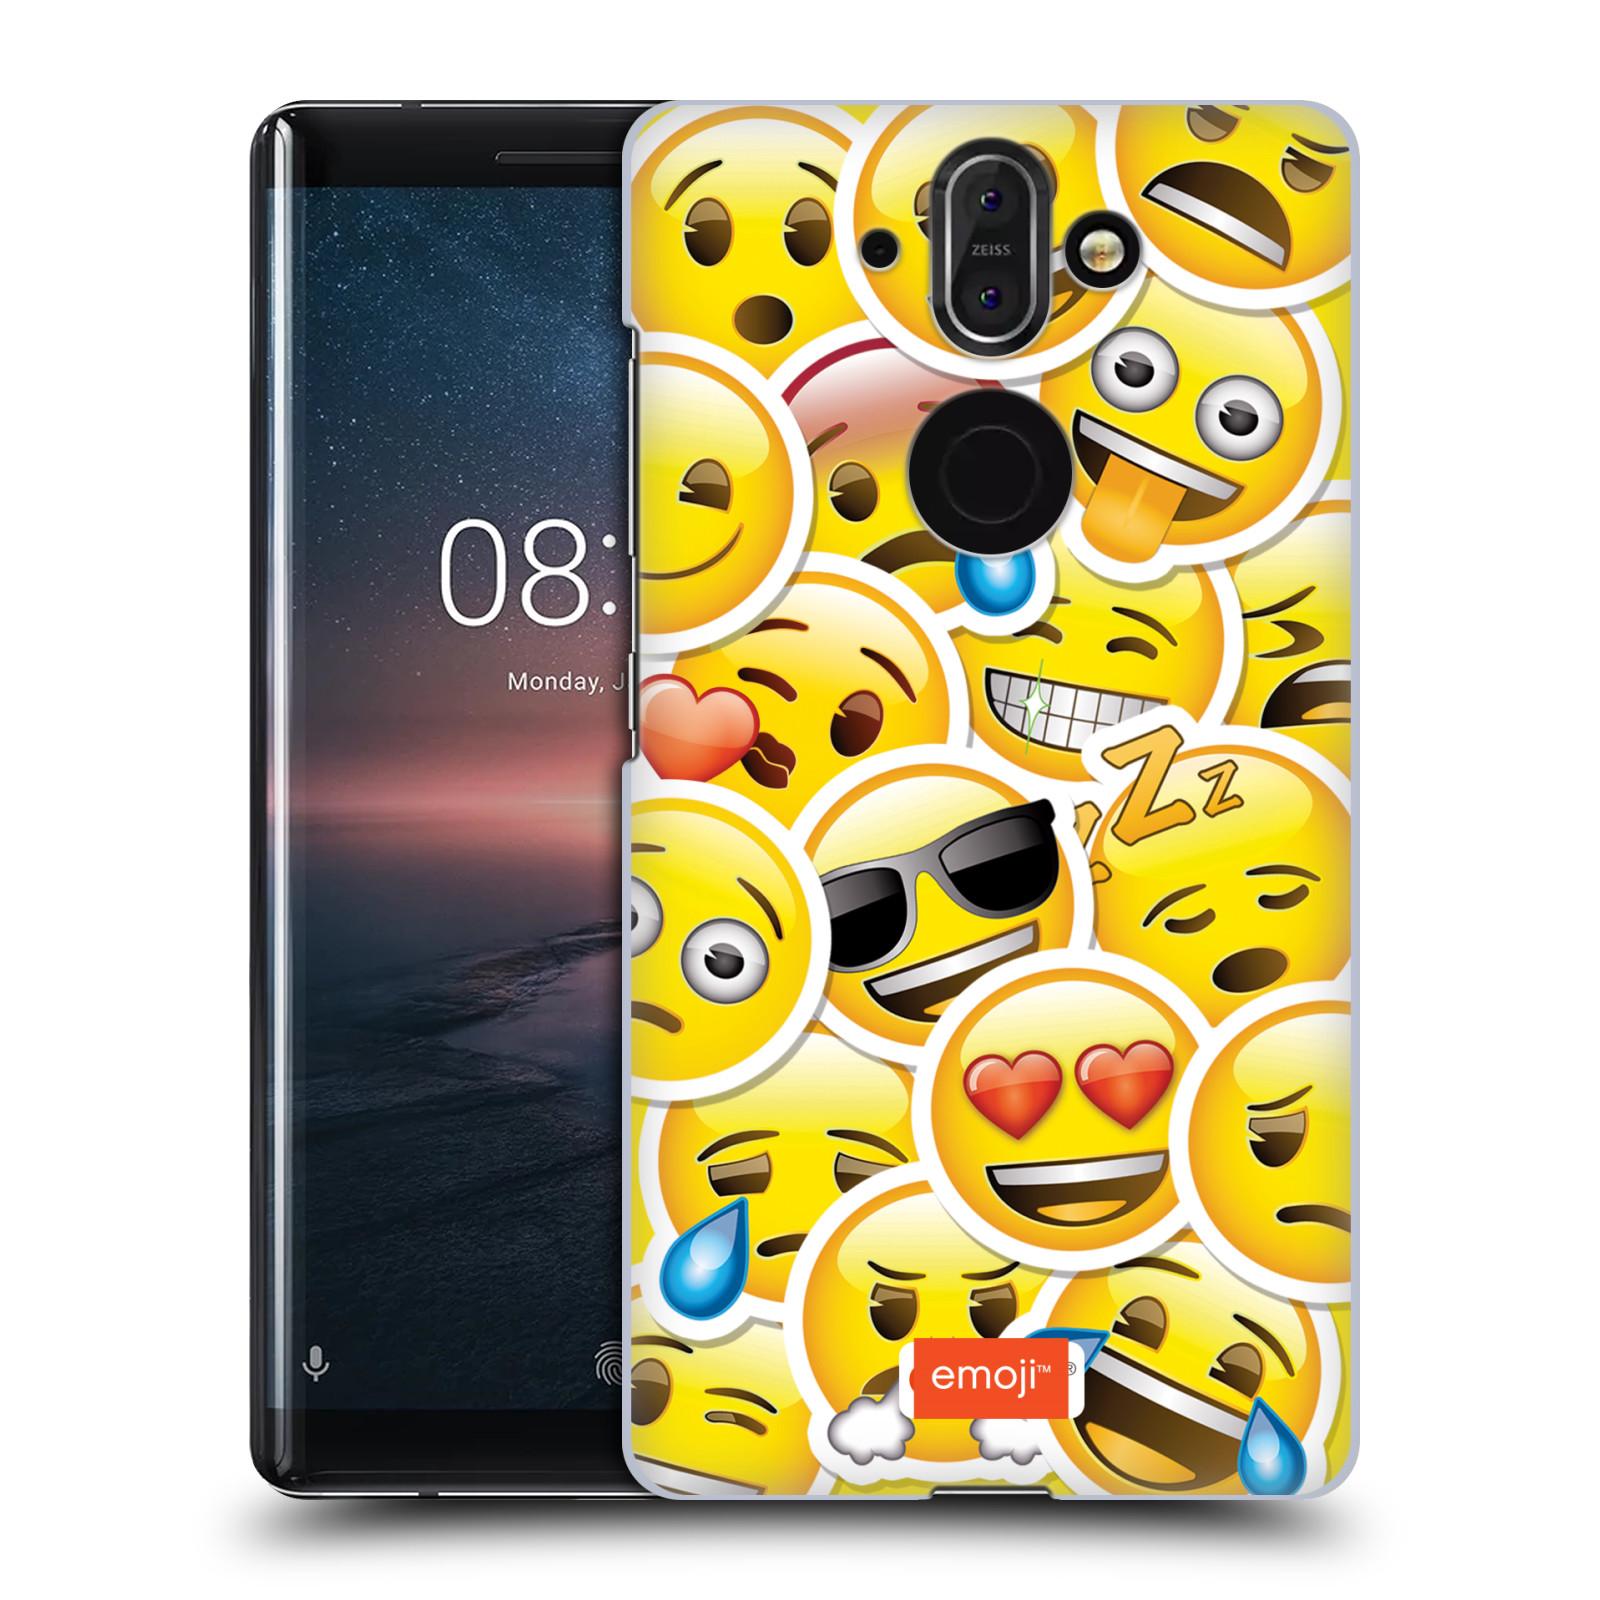 Plastové pouzdro na mobil Nokia 8 Sirocco - Head Case - EMOJI - Velcí smajlíci ZZ